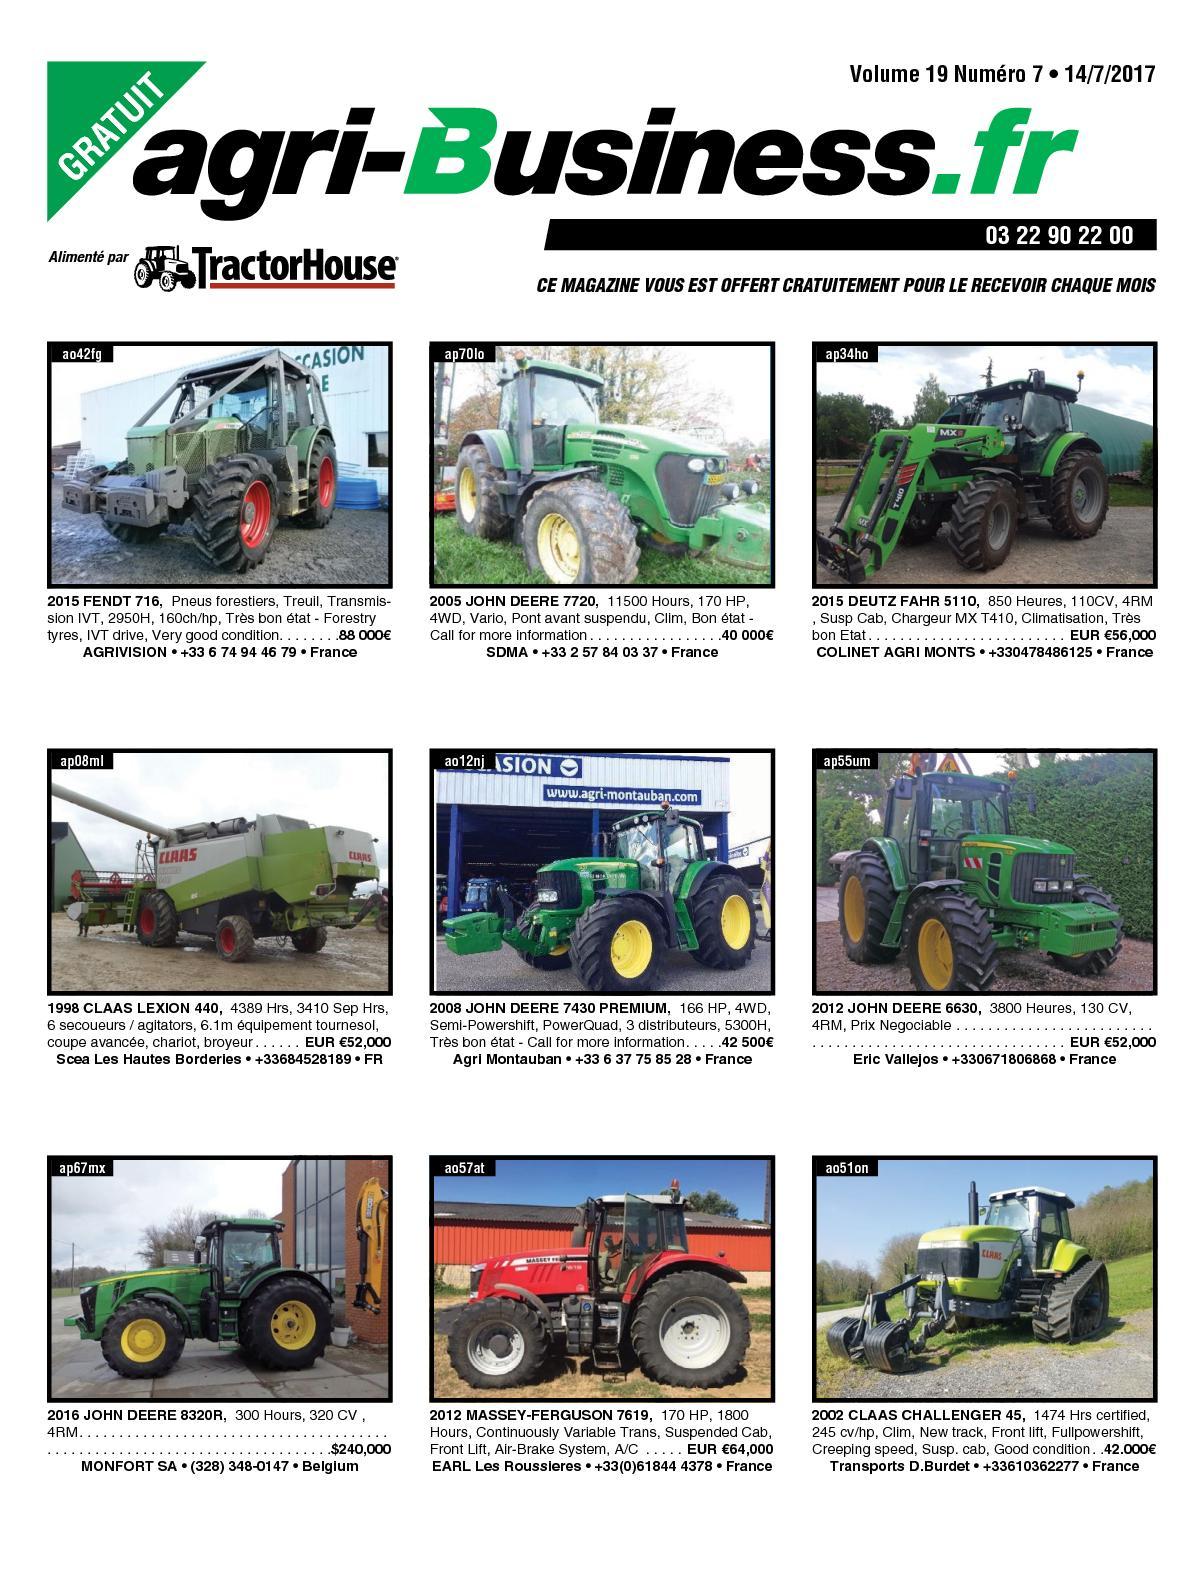 Calaméo - AGRI BUSINESS VOLUME 19 NUMÉRO 7 • 14/O7/2017